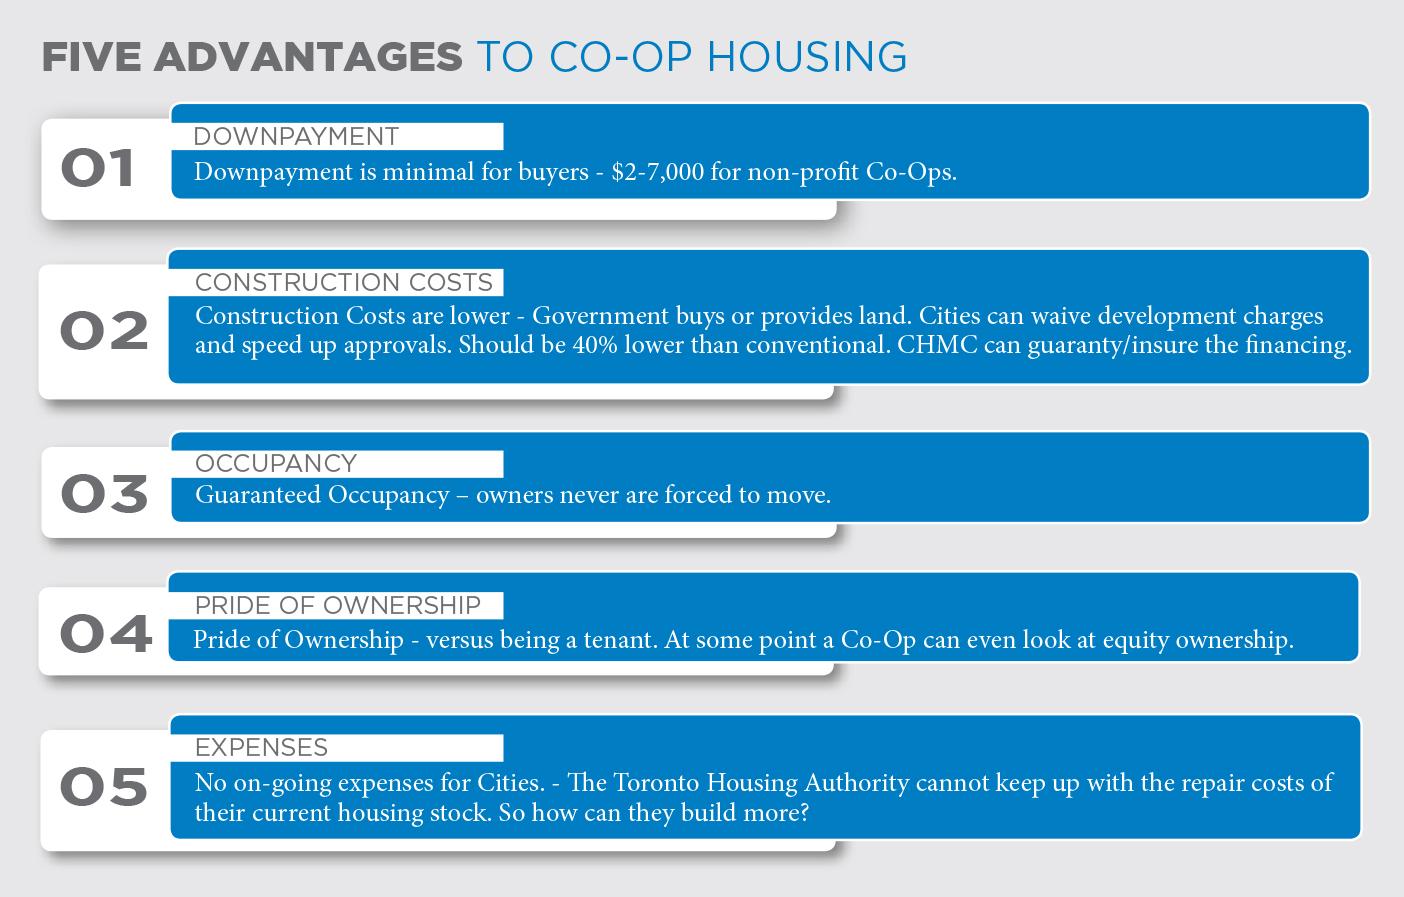 5 advantages for coop housing